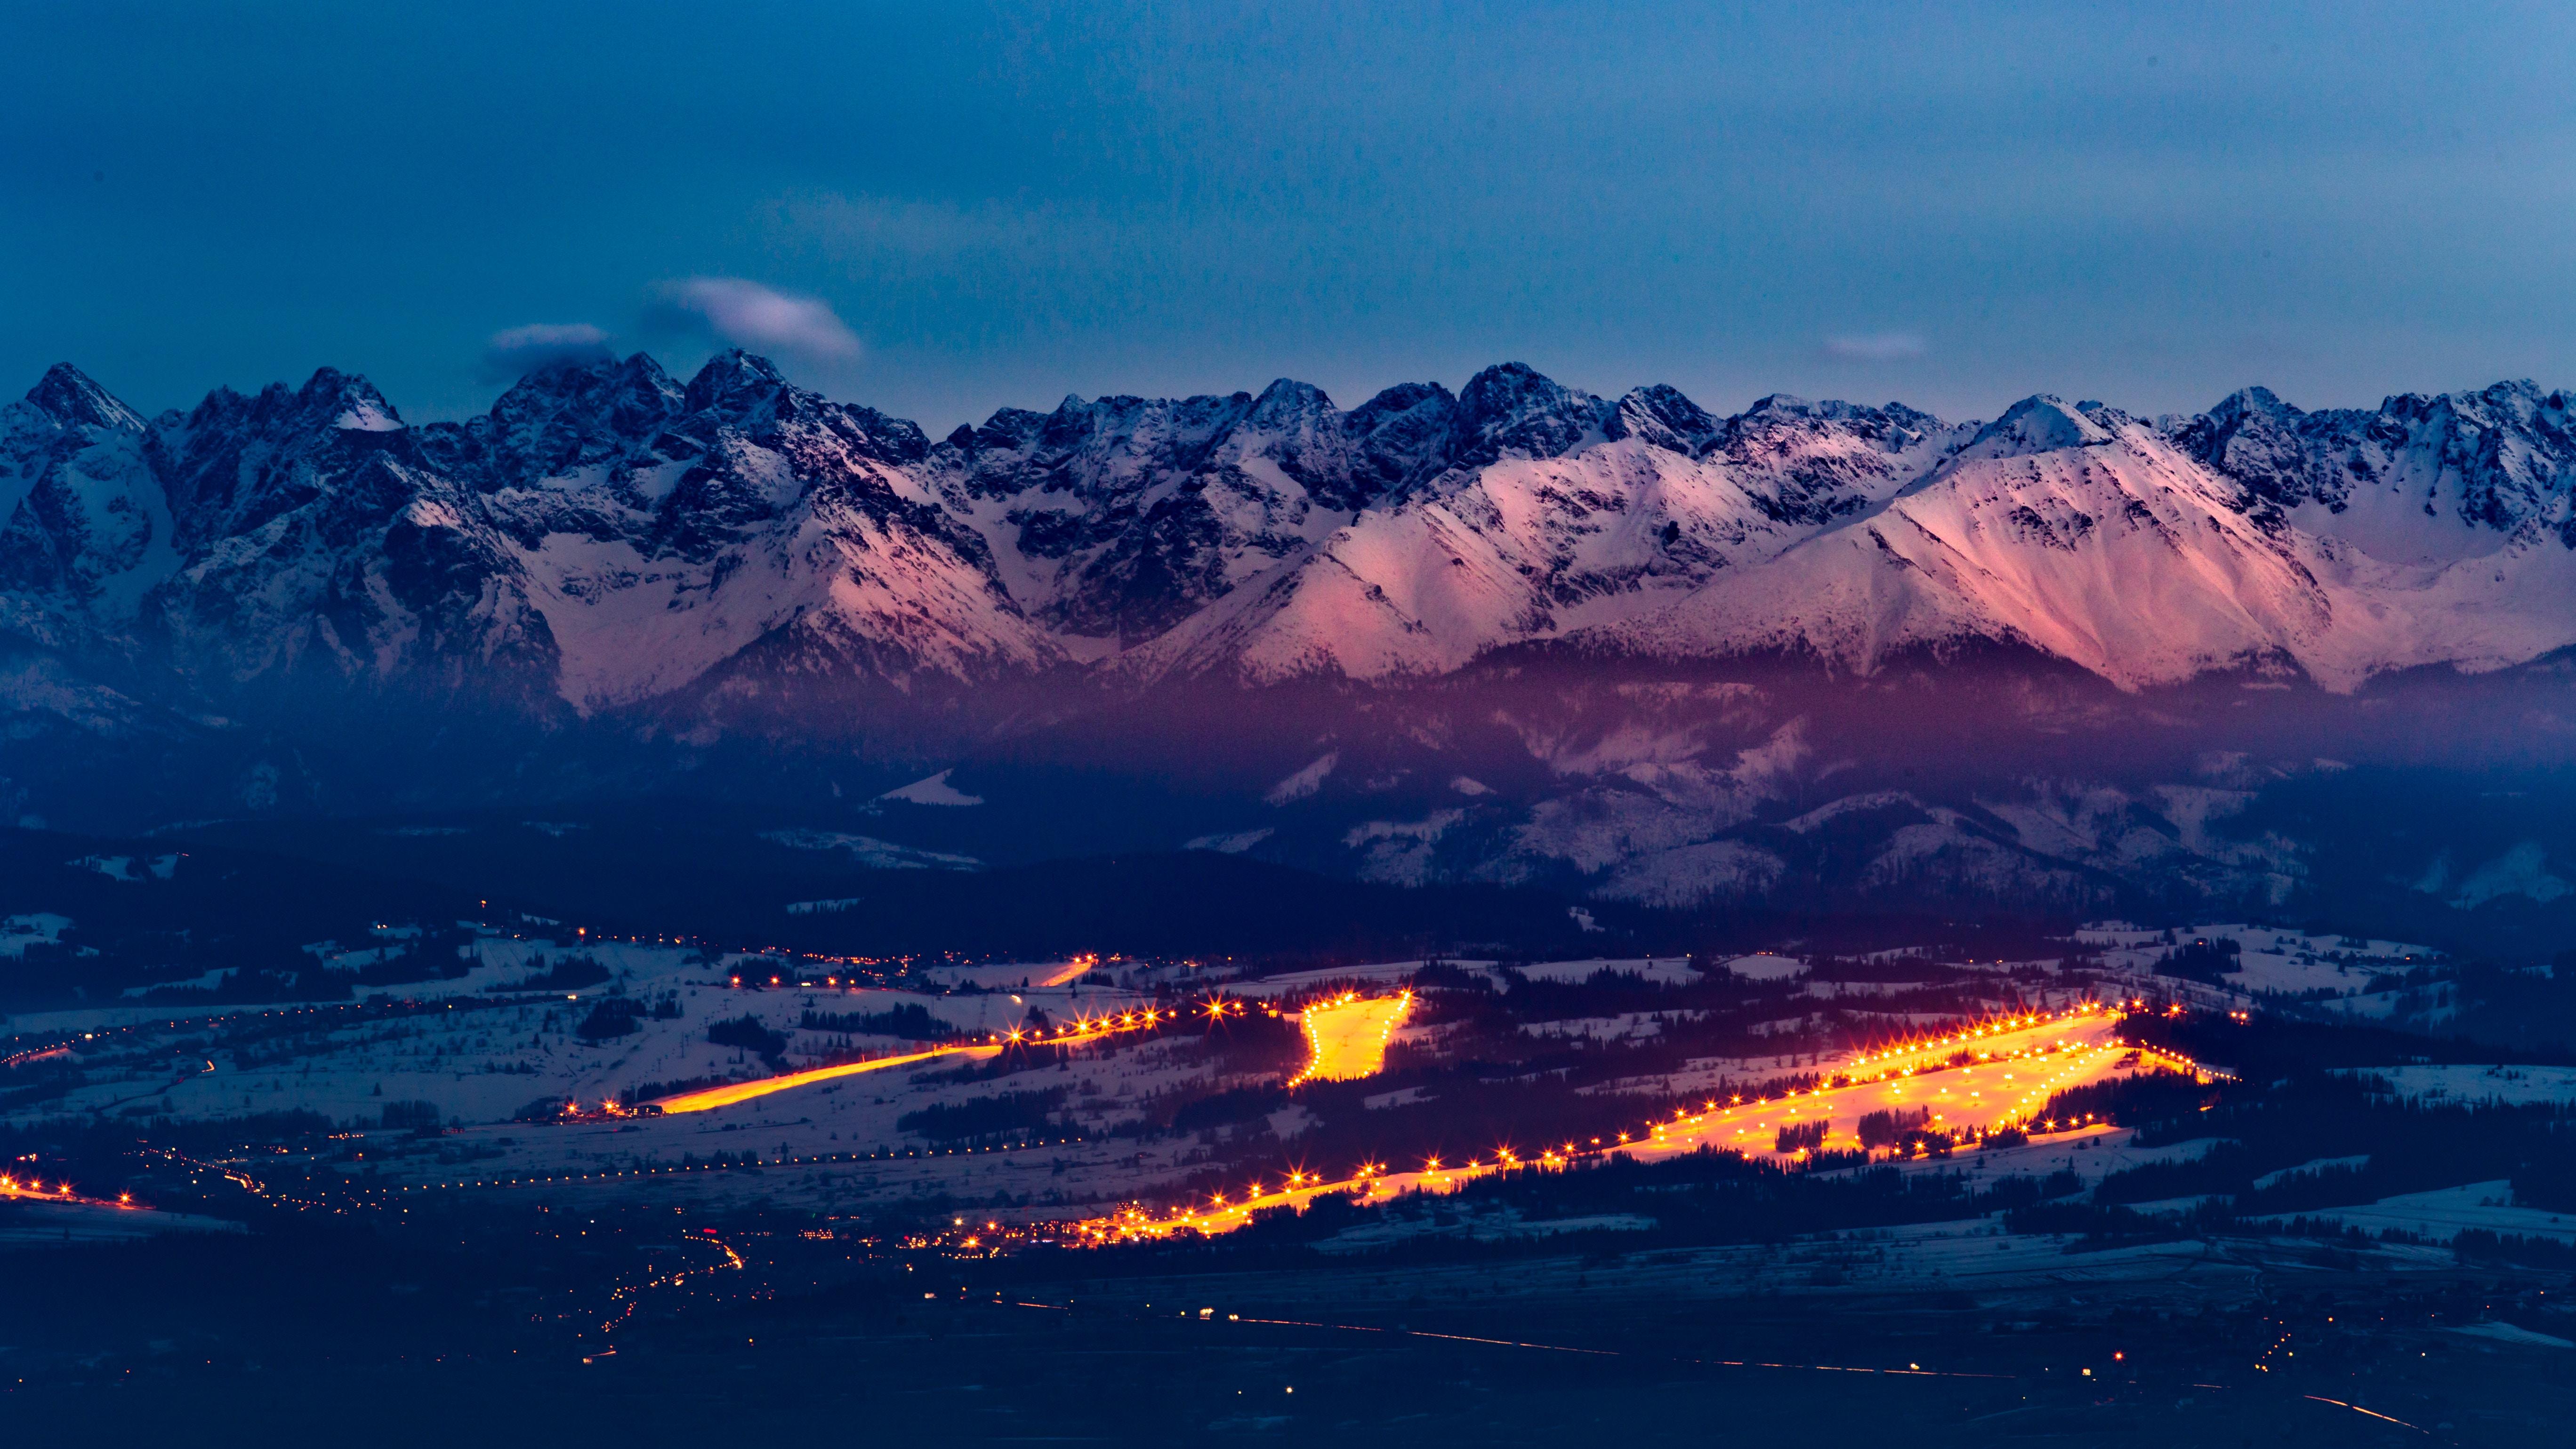 tatra mountains snowy 1574939472 - Tatra Mountains Snowy -